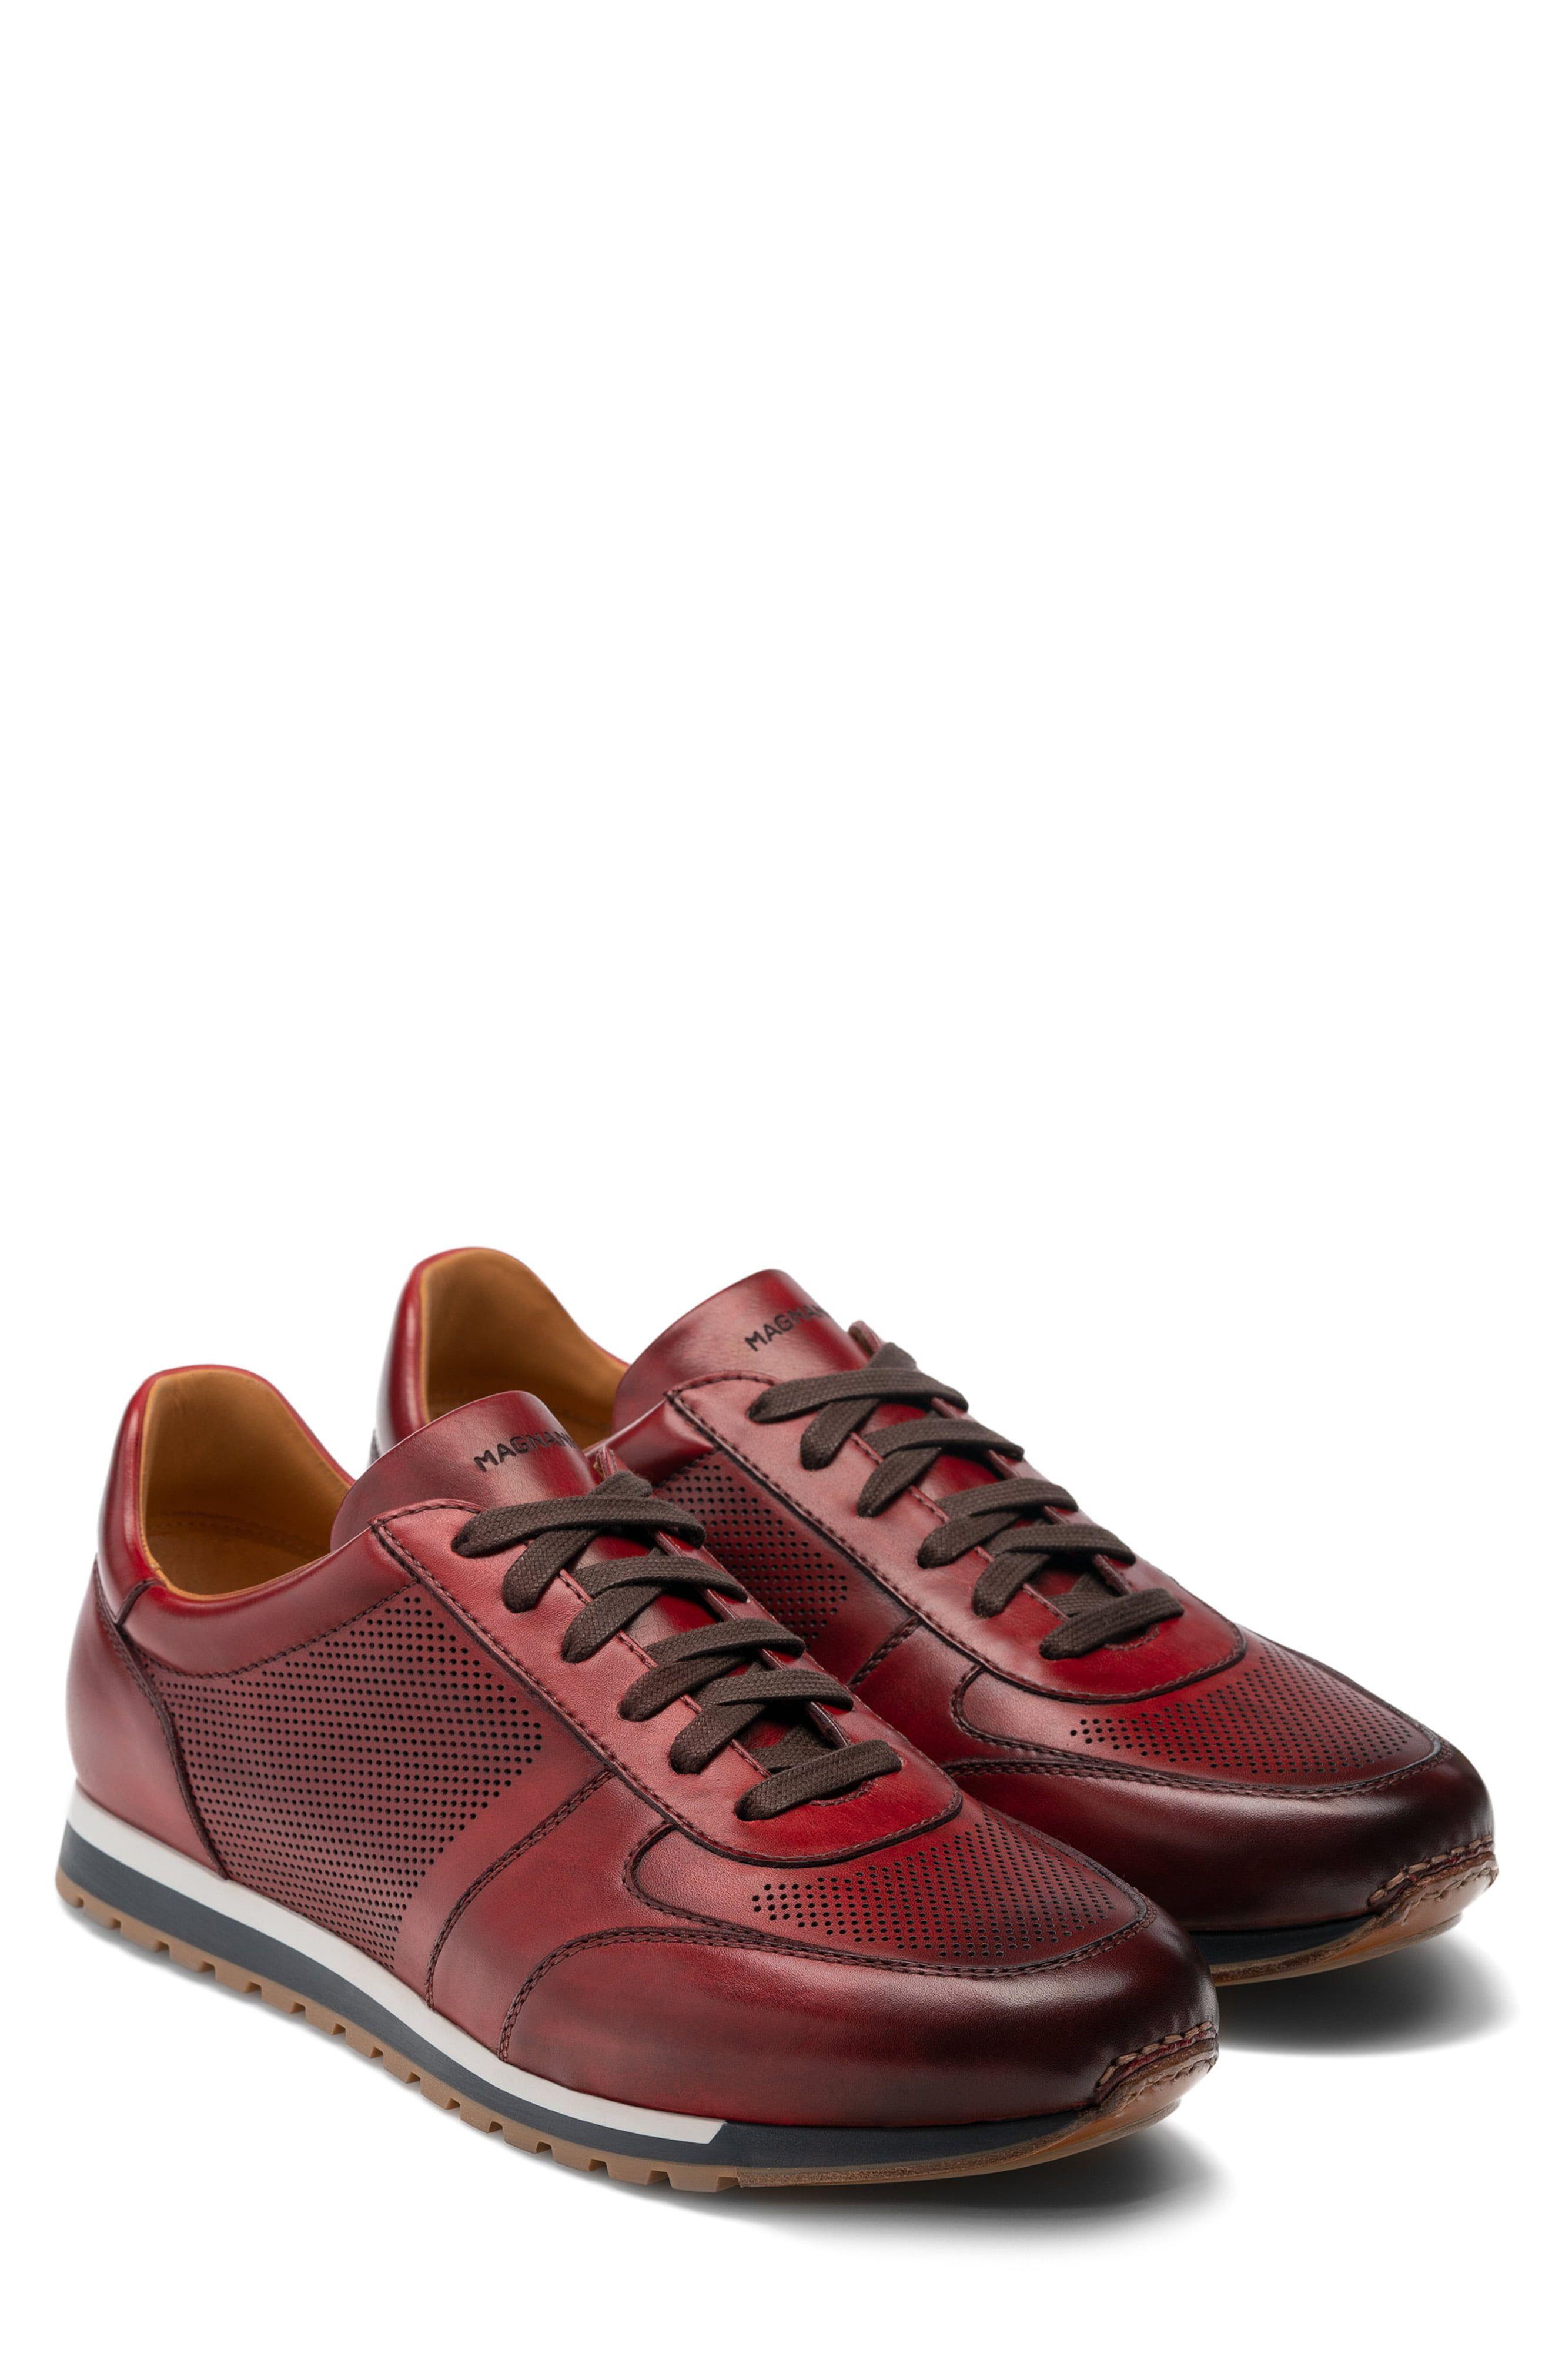 Magnanni Brava Sneaker (Men